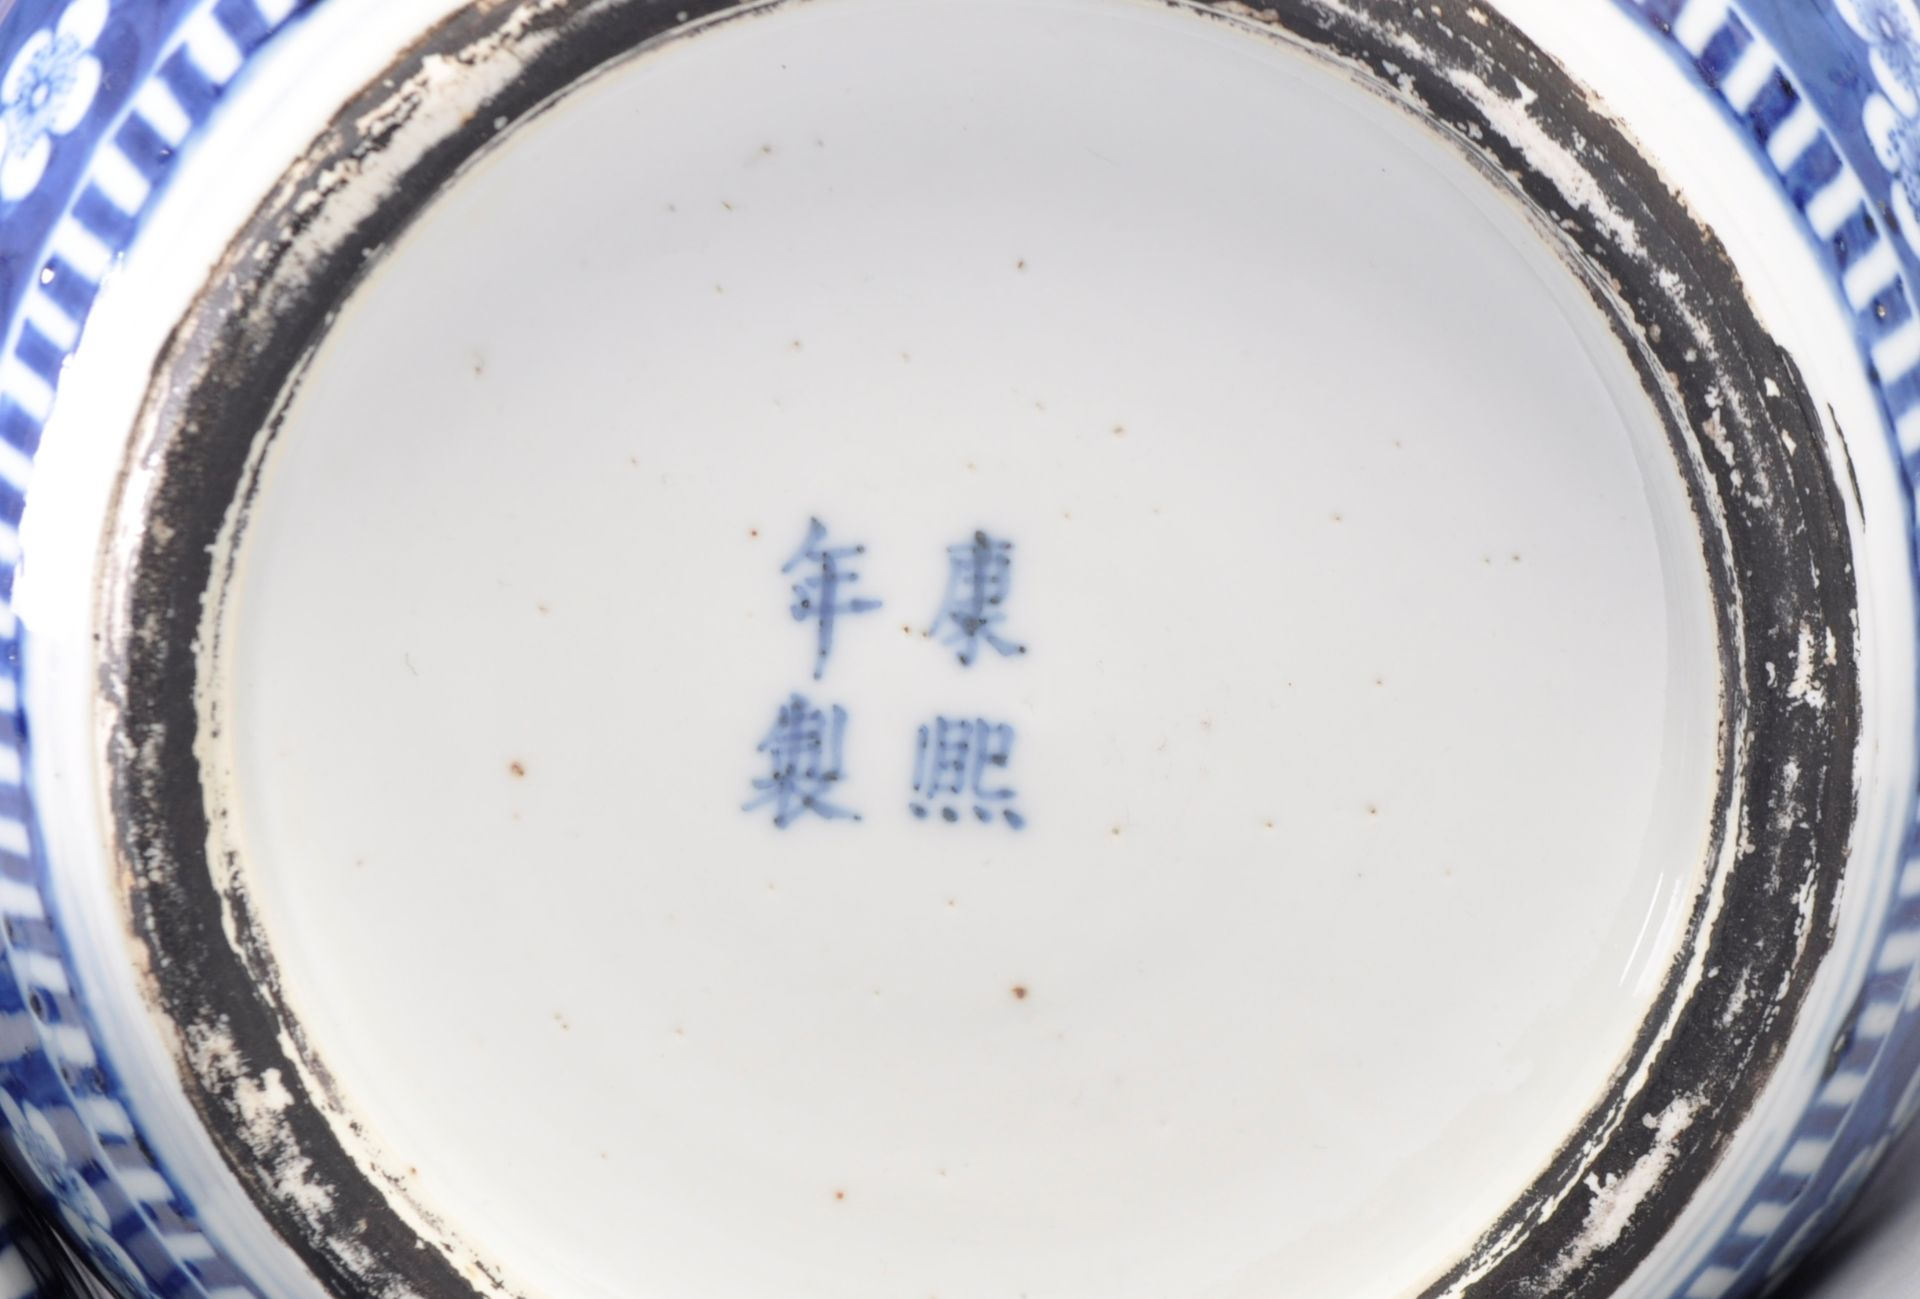 LARGE AND IMPRESSIVE PAIR OF CHINESE KANGXI MARK LIDDED JARS - Image 11 of 13